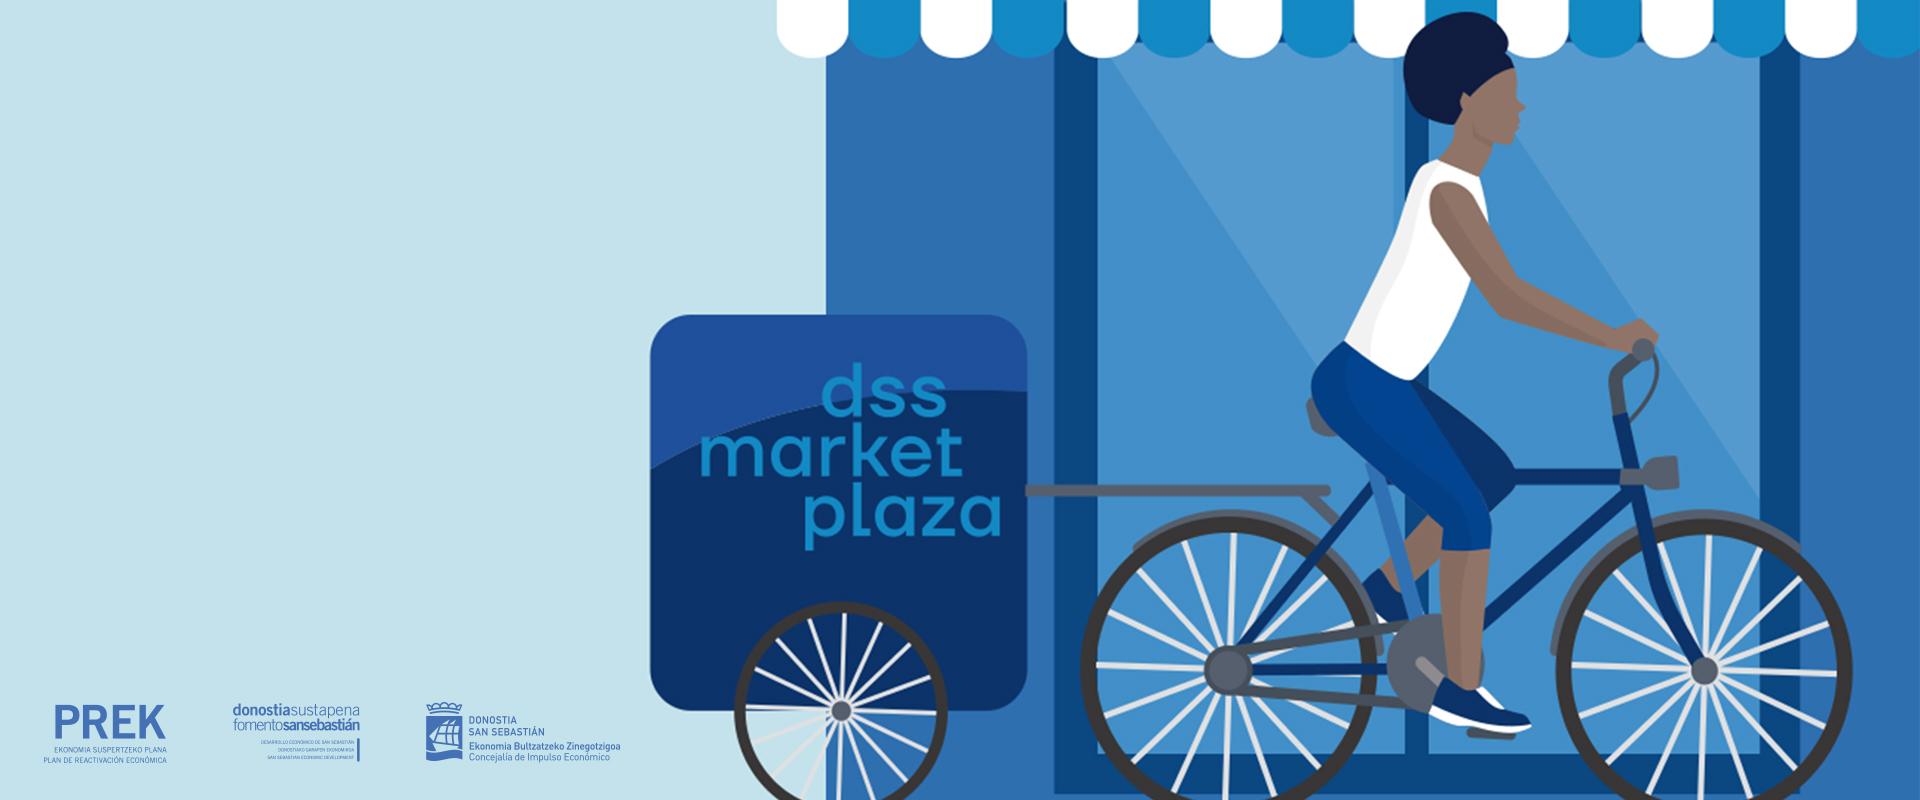 Donostia Market Plaza